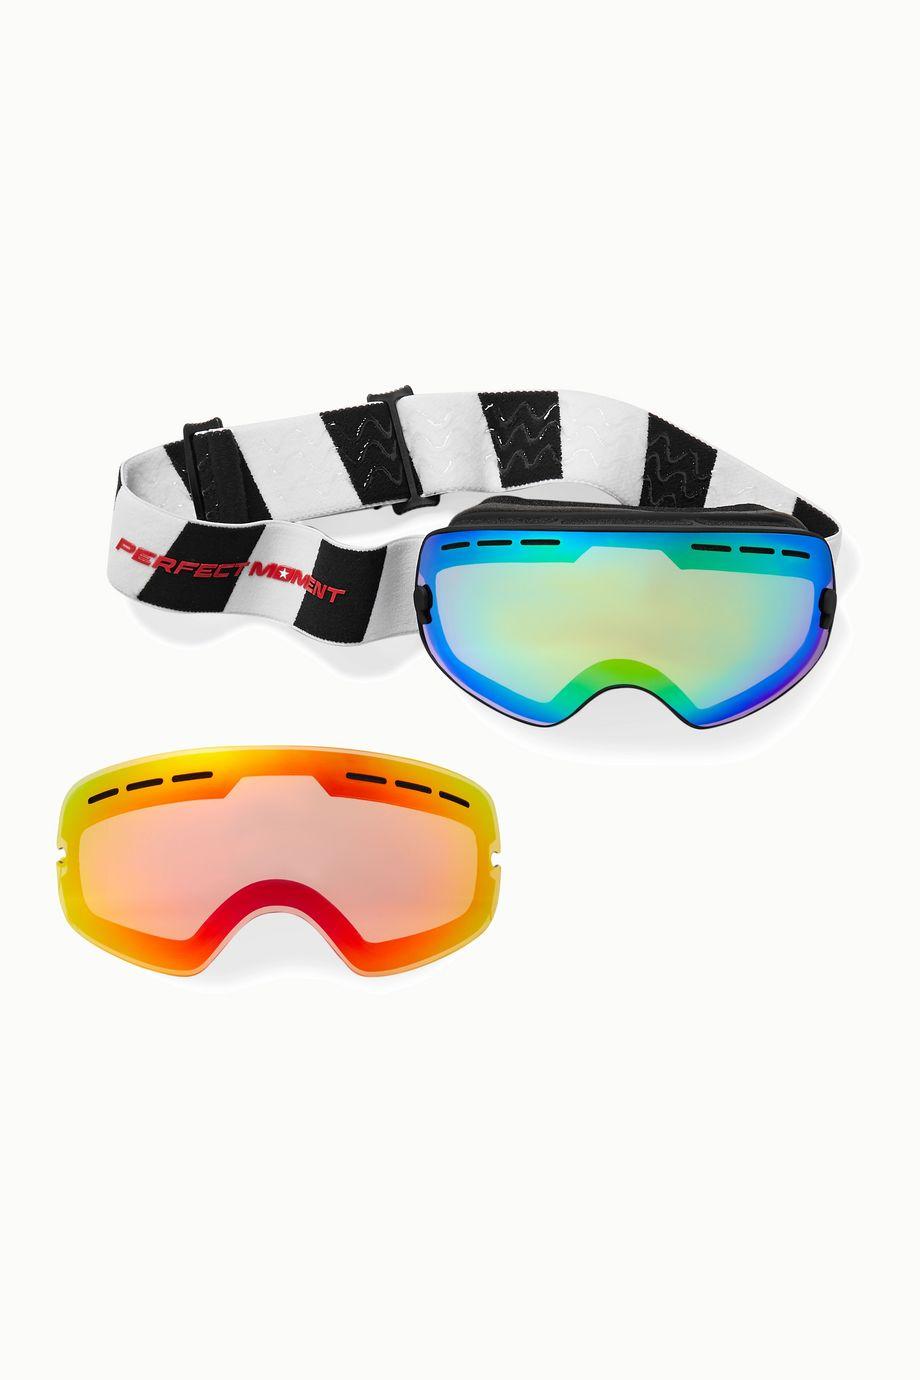 Perfect Moment Kids Mountain Mission mirrored ski goggles